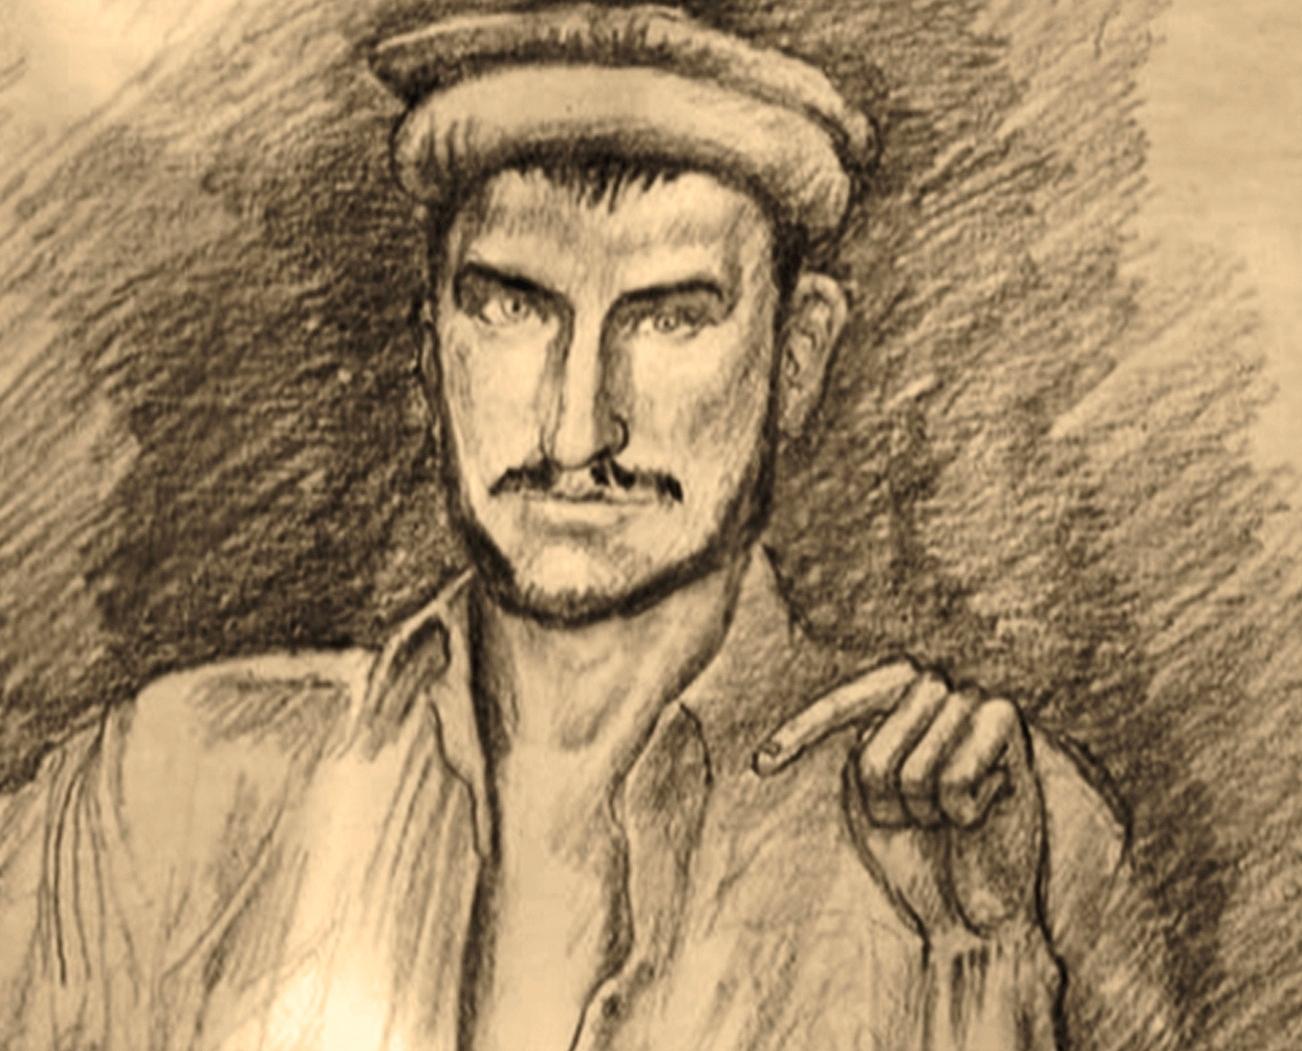 Николай Шевченко («Абдурахмон») вплену. Рисунок дляфильма «Тайна лагеря Бадабер. Афганский капкан»